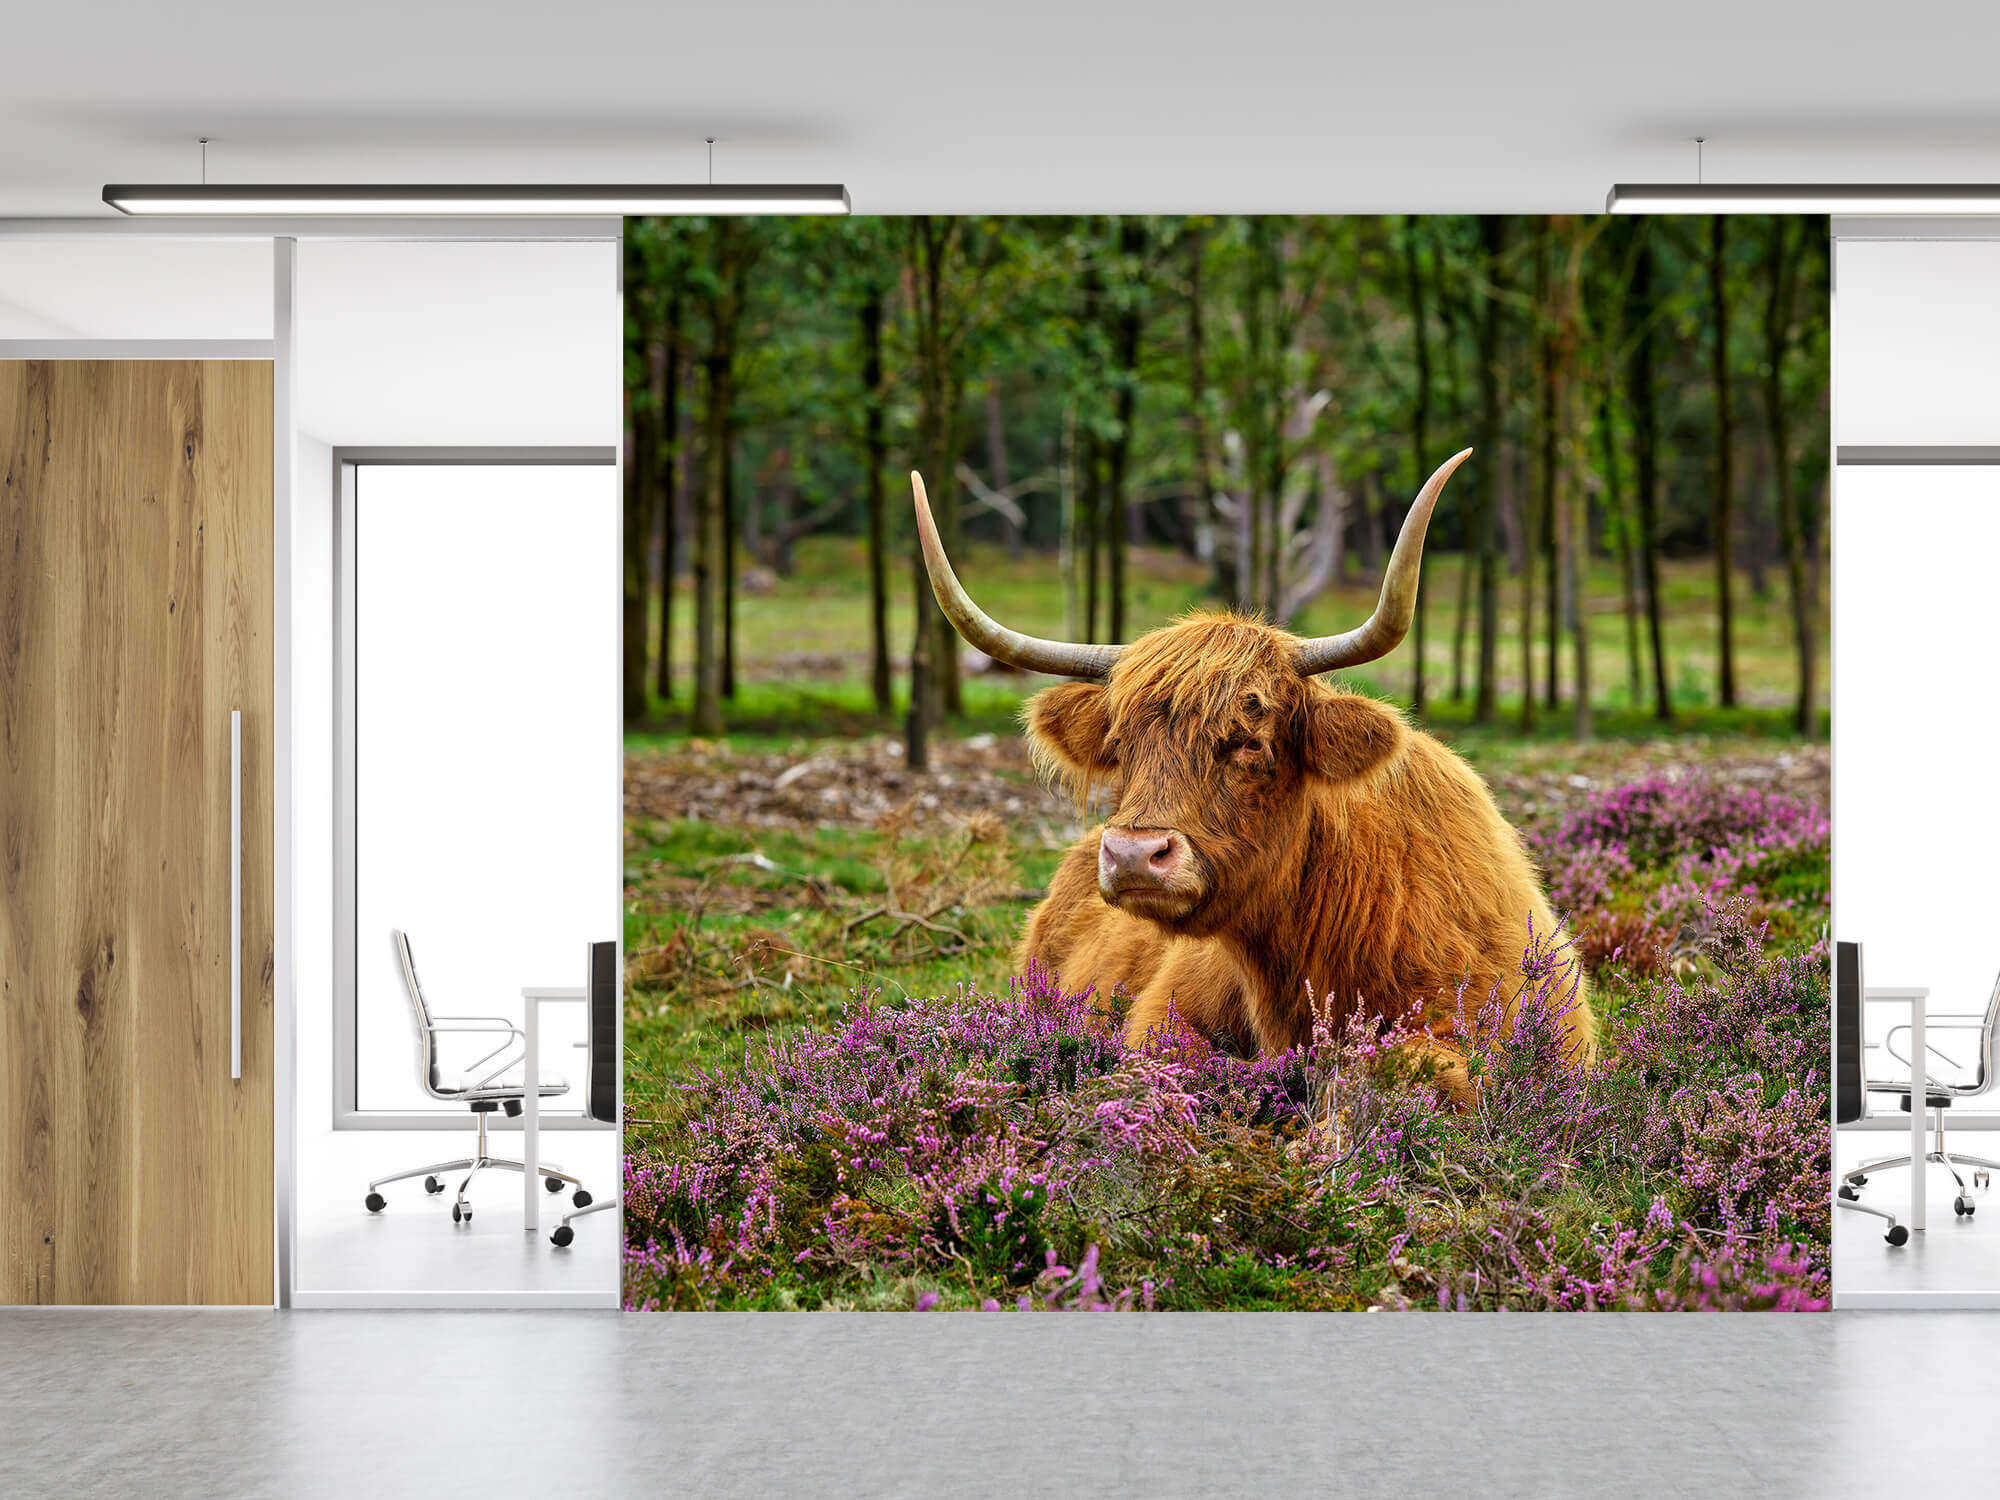 Hooglanders - Schotse hooglander tussen paarse heide 11